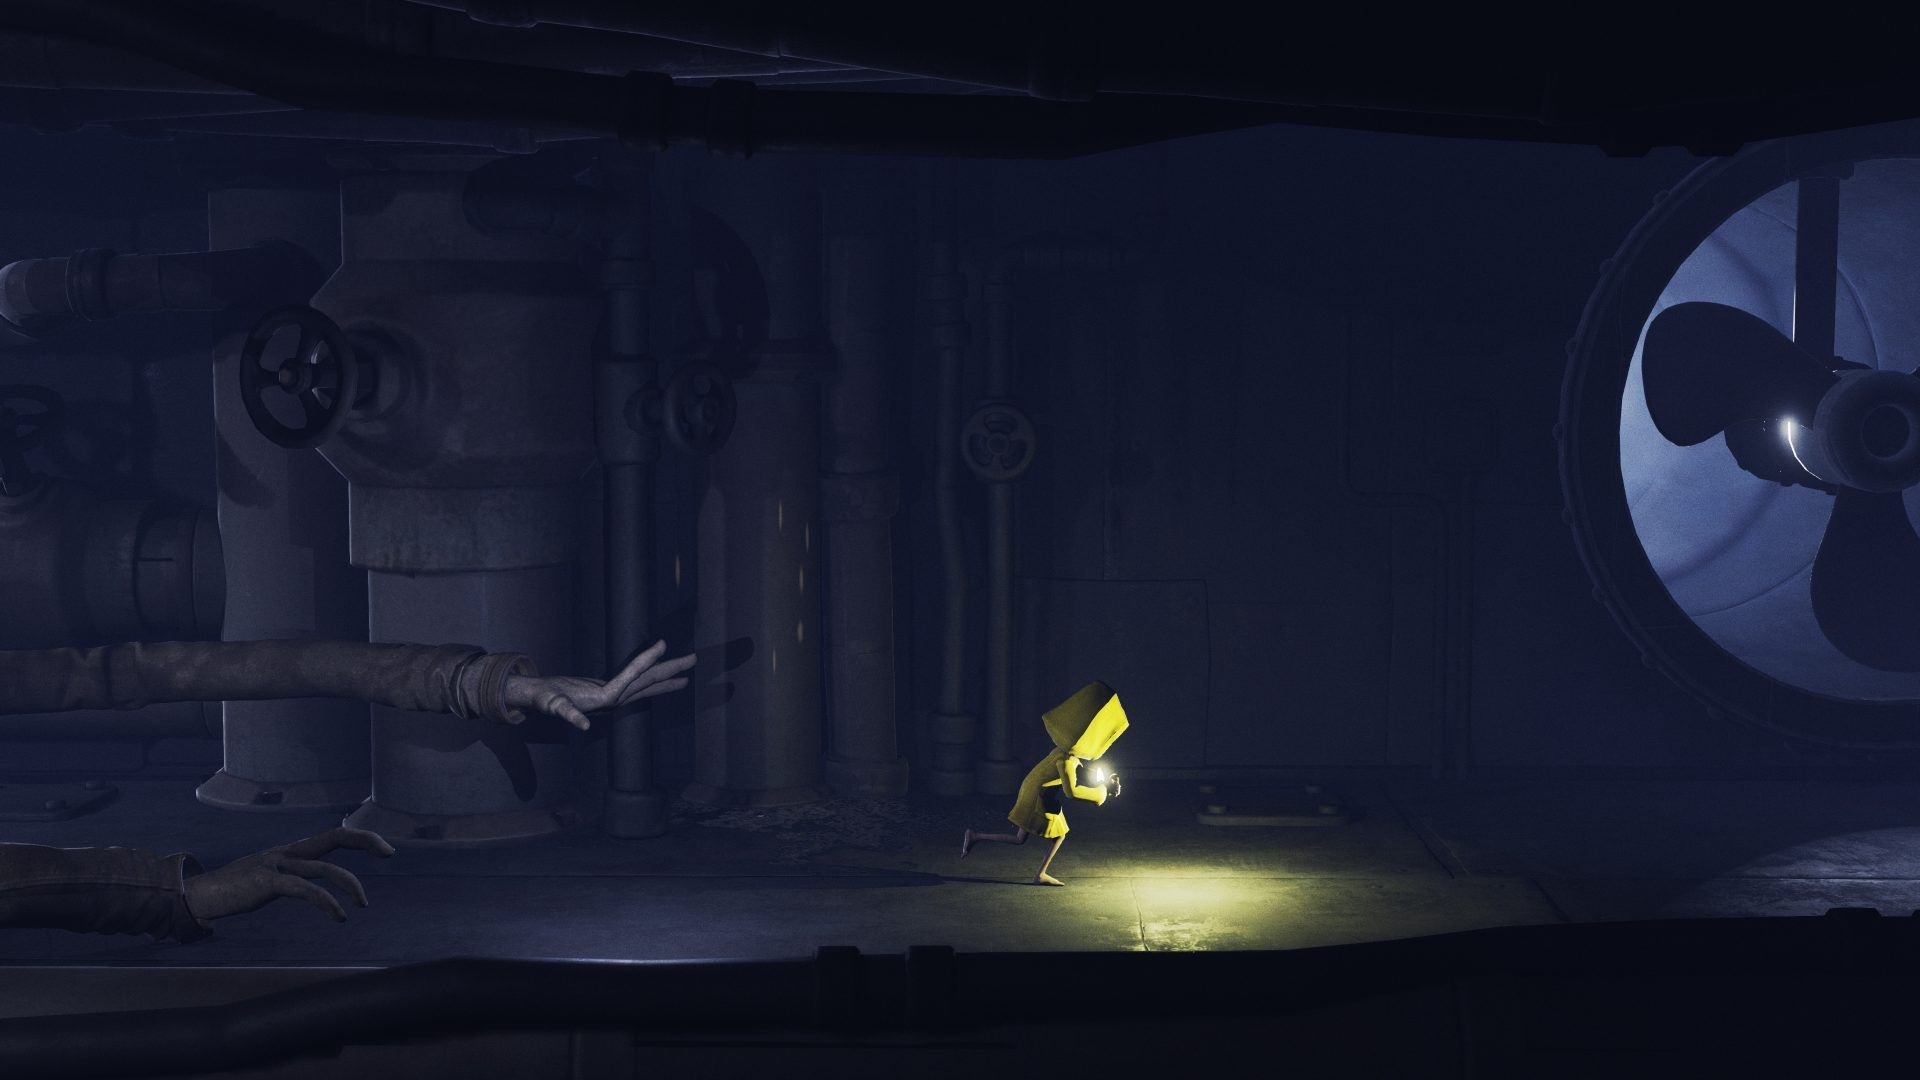 LN_Gamescom_Screenshot_03_EscapingTheDarkCorridor